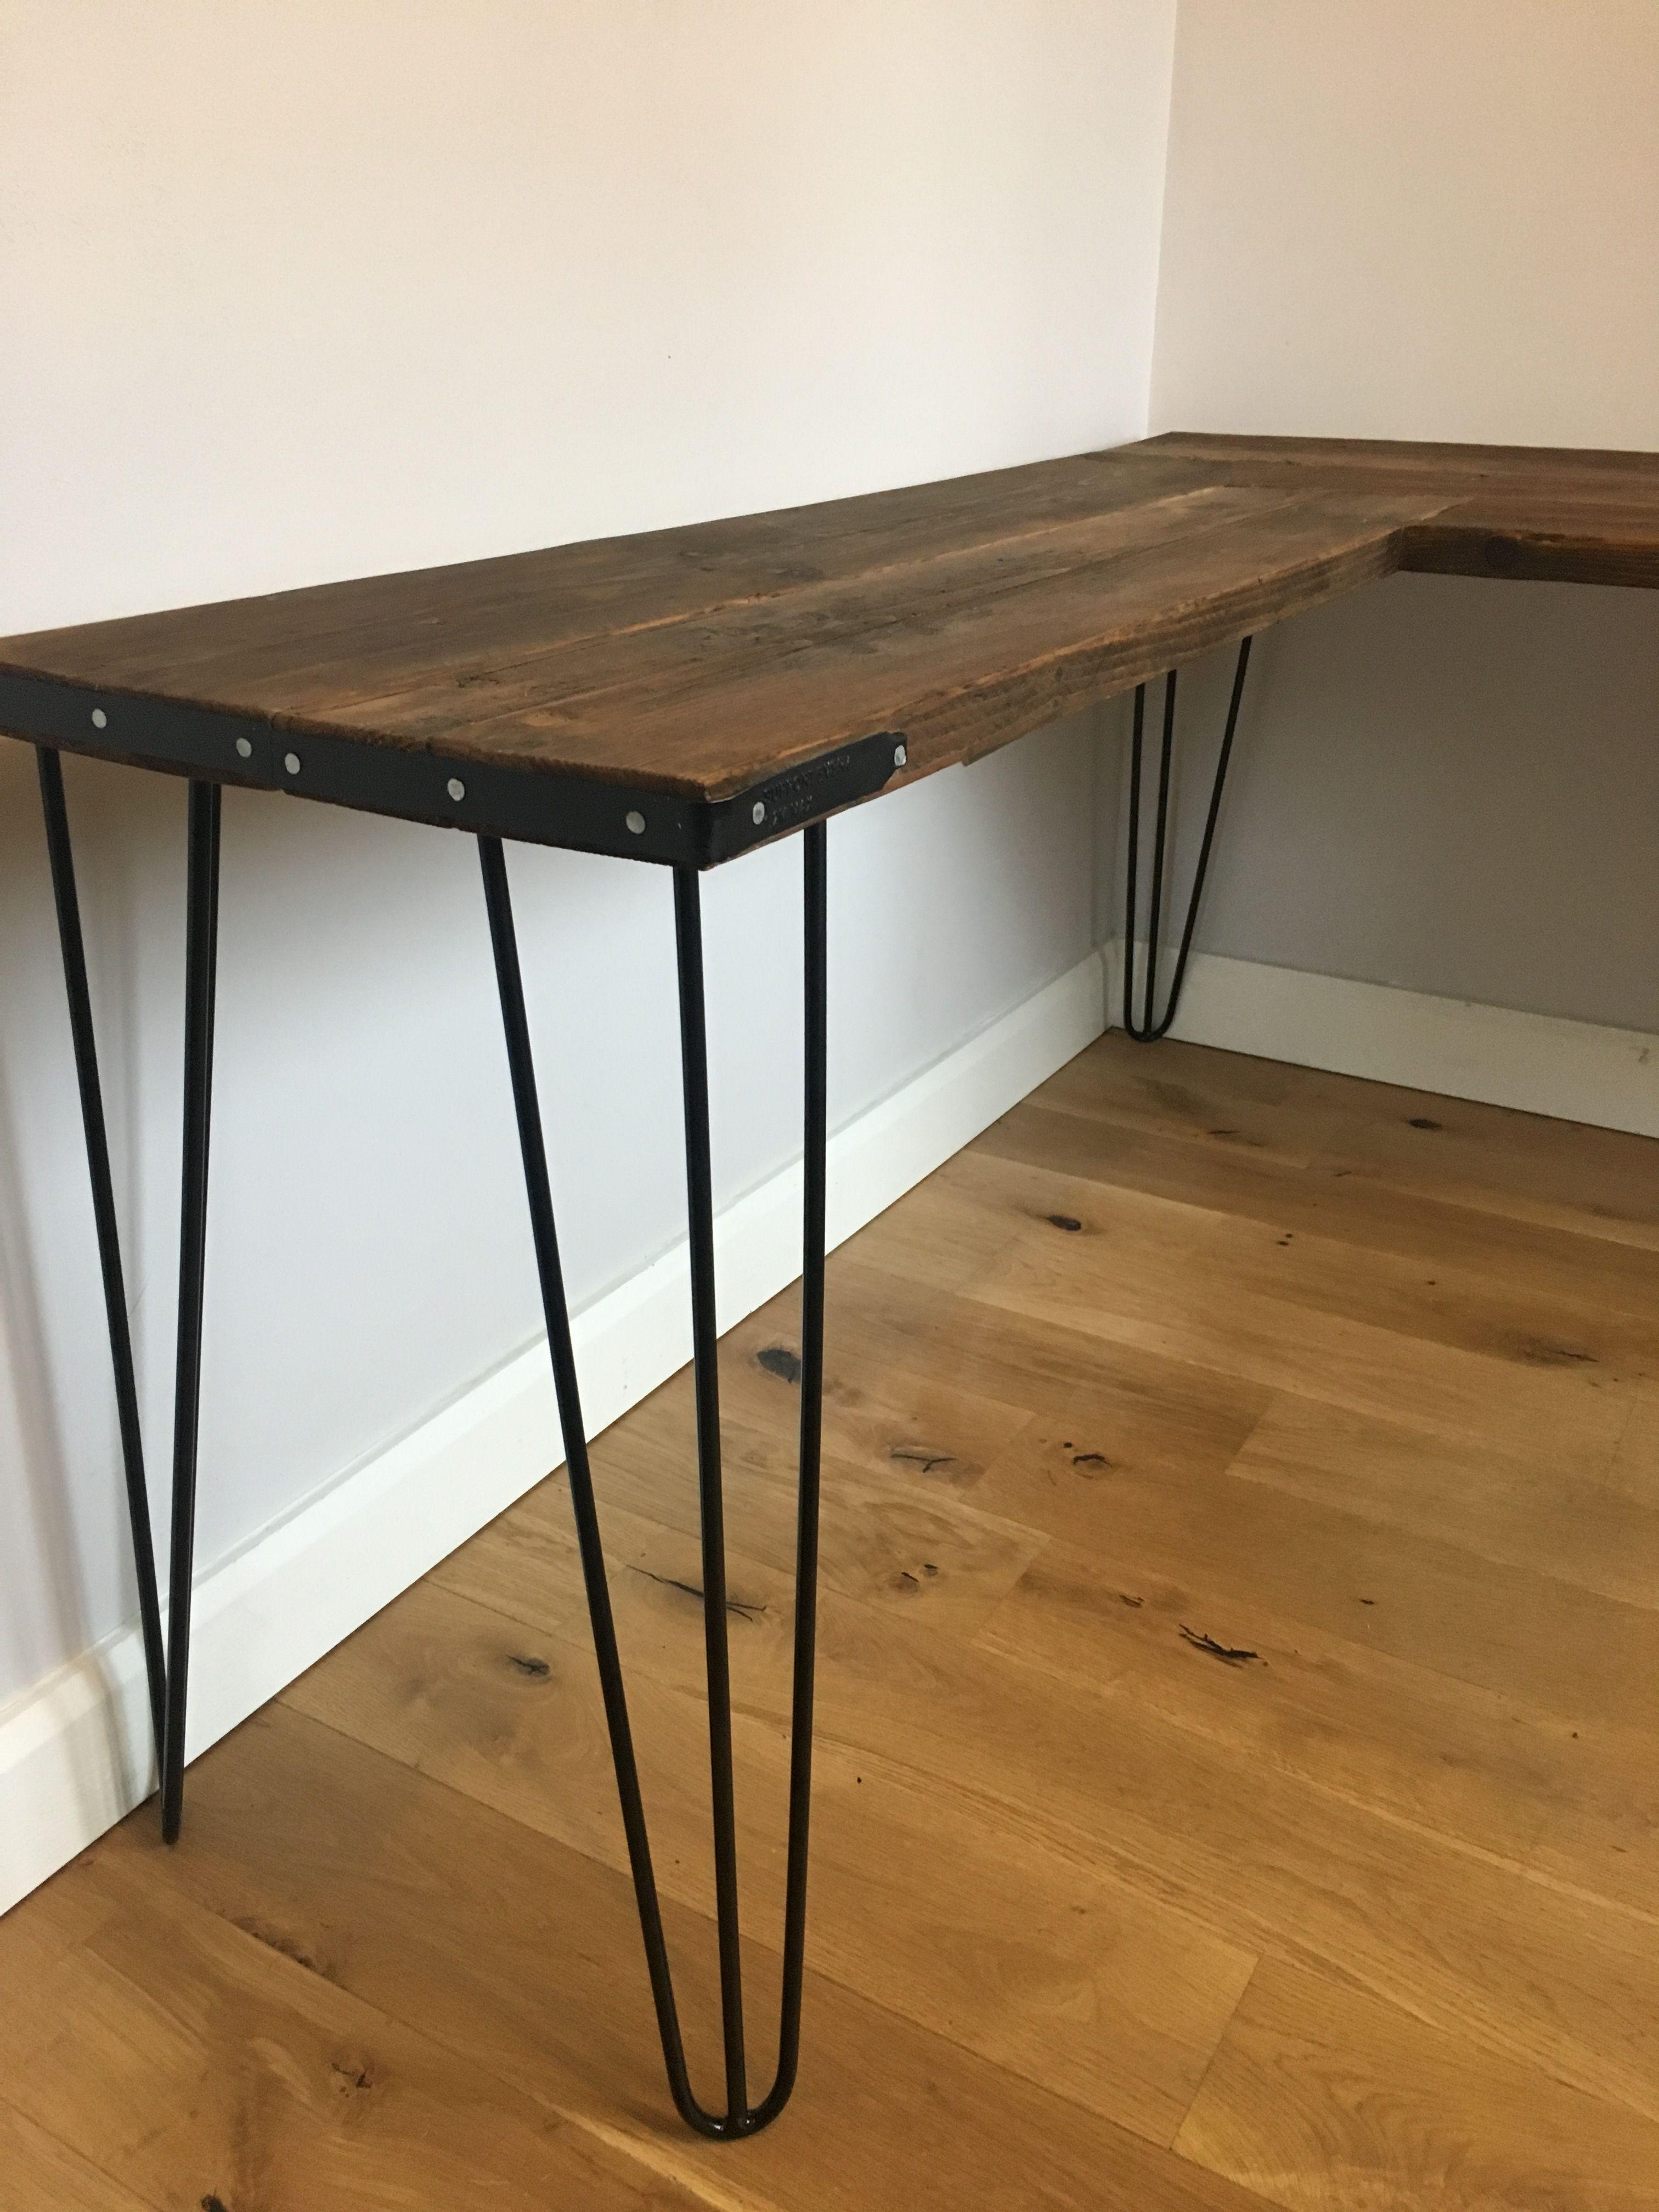 Homemade Corner Scaffolding Board Desk With Hairpin Legs Woodworking Furniture Plans Industrial Design Furniture Diy Corner Desk